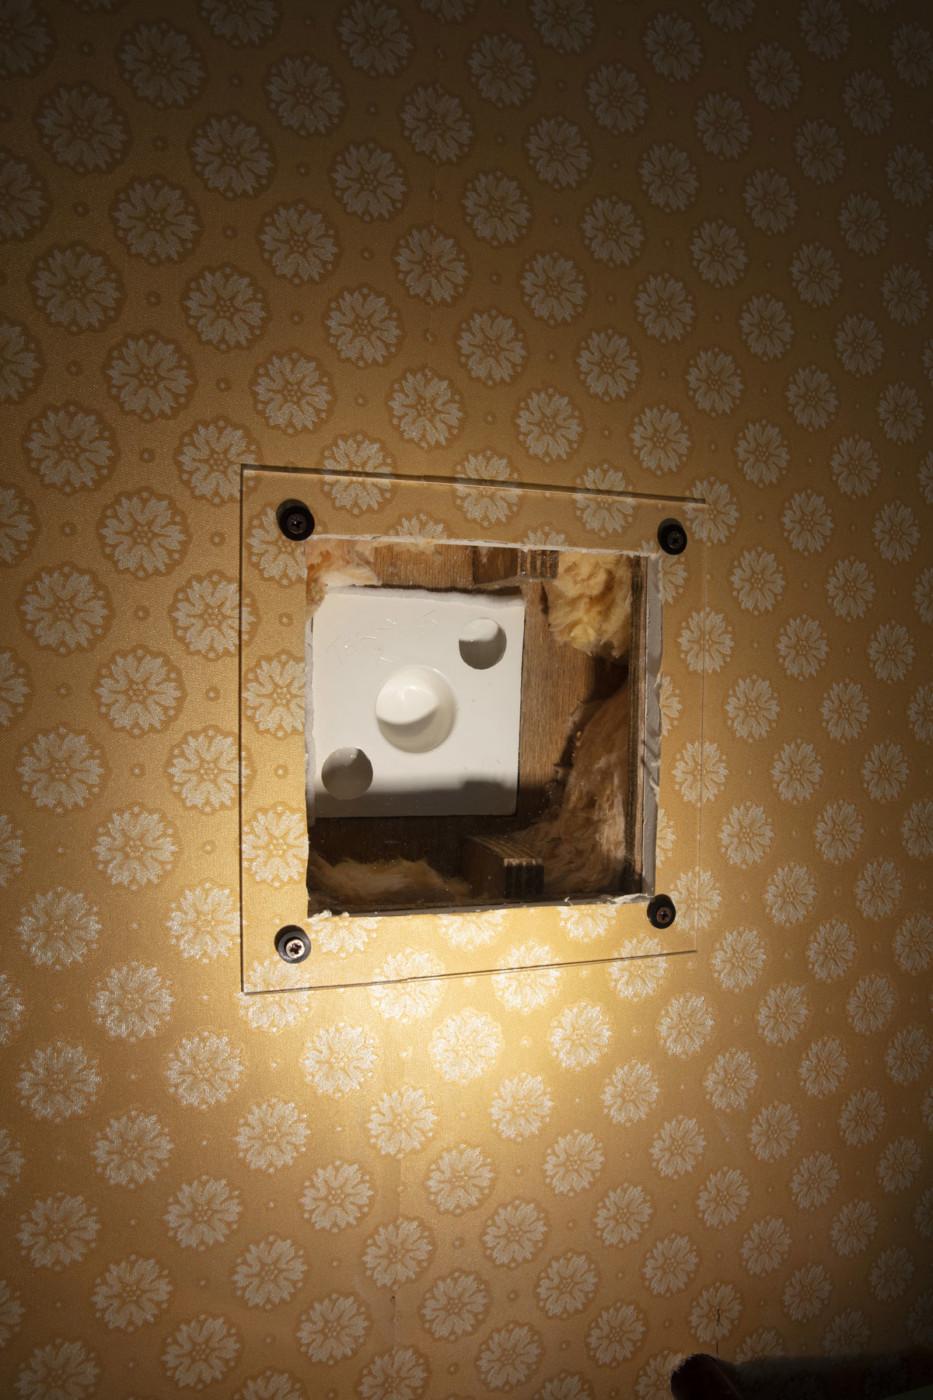 BRADLEY KRONZ  Untitled,  2020 (detail) Mixed media 165,1 x 96,5 x 101,6 cm / 65 x 38 x 40 in - High Art Gallery Paris